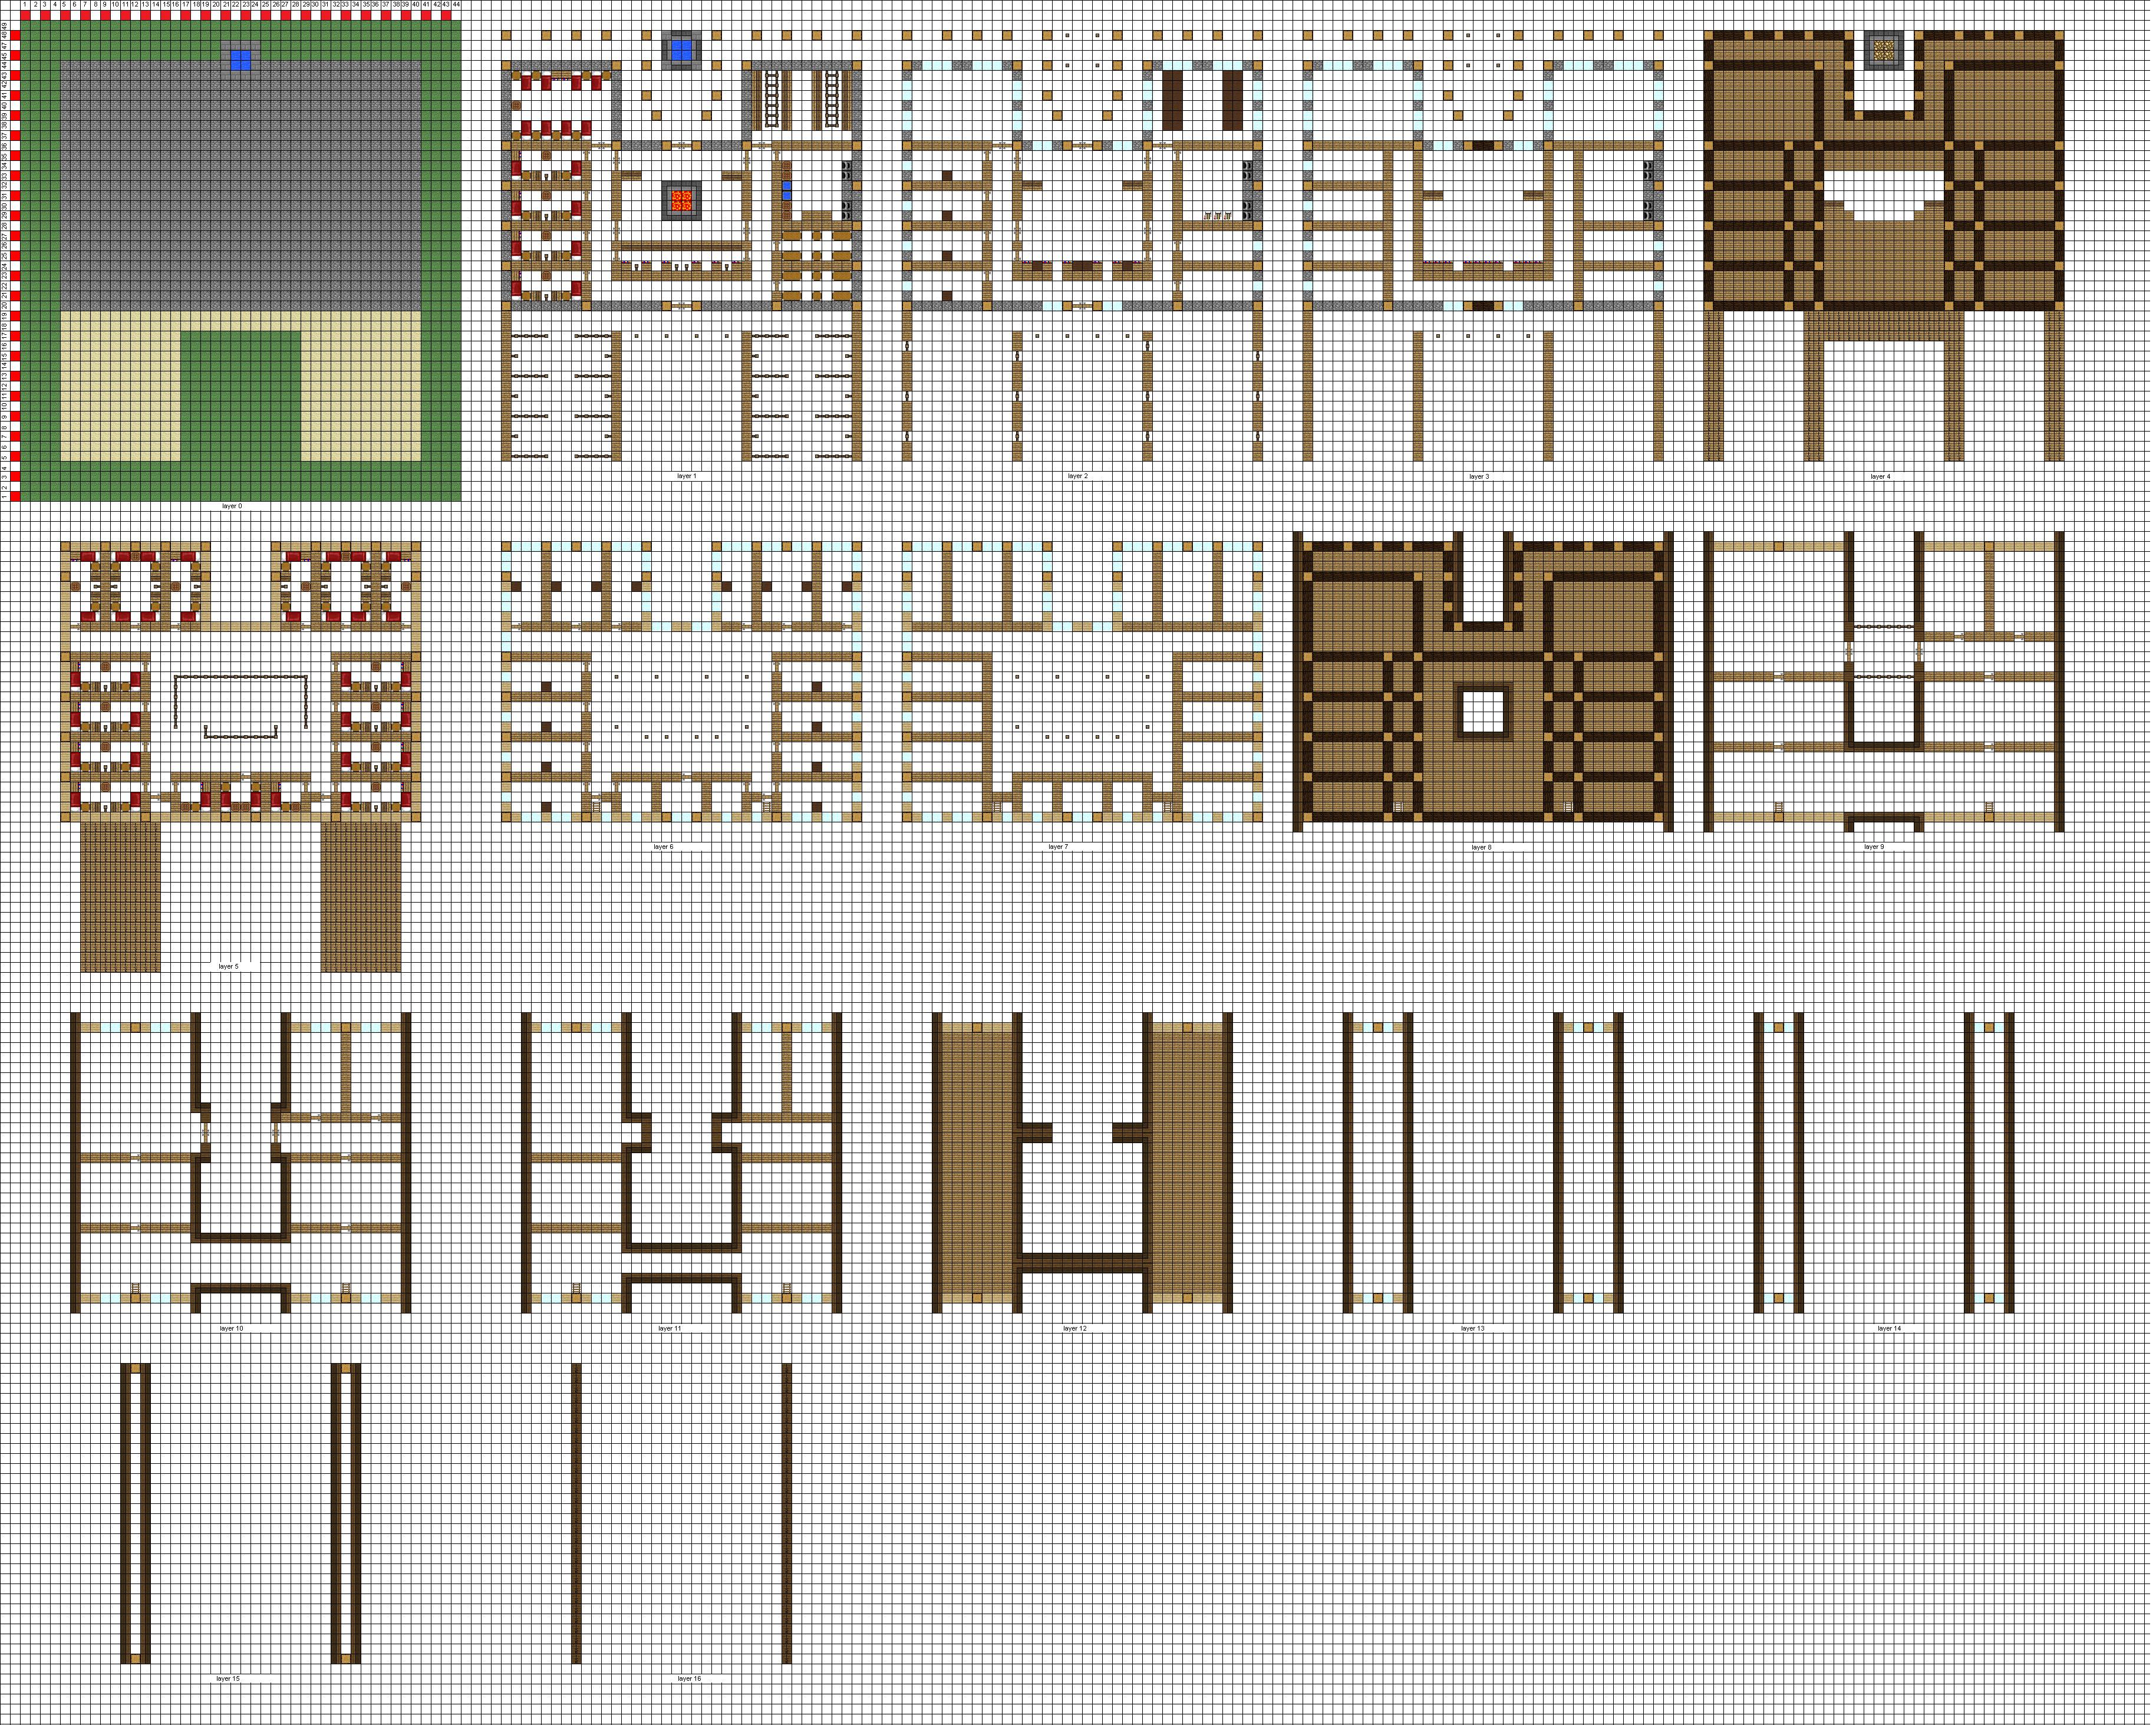 Minecraft large Inn floorplans WiP by